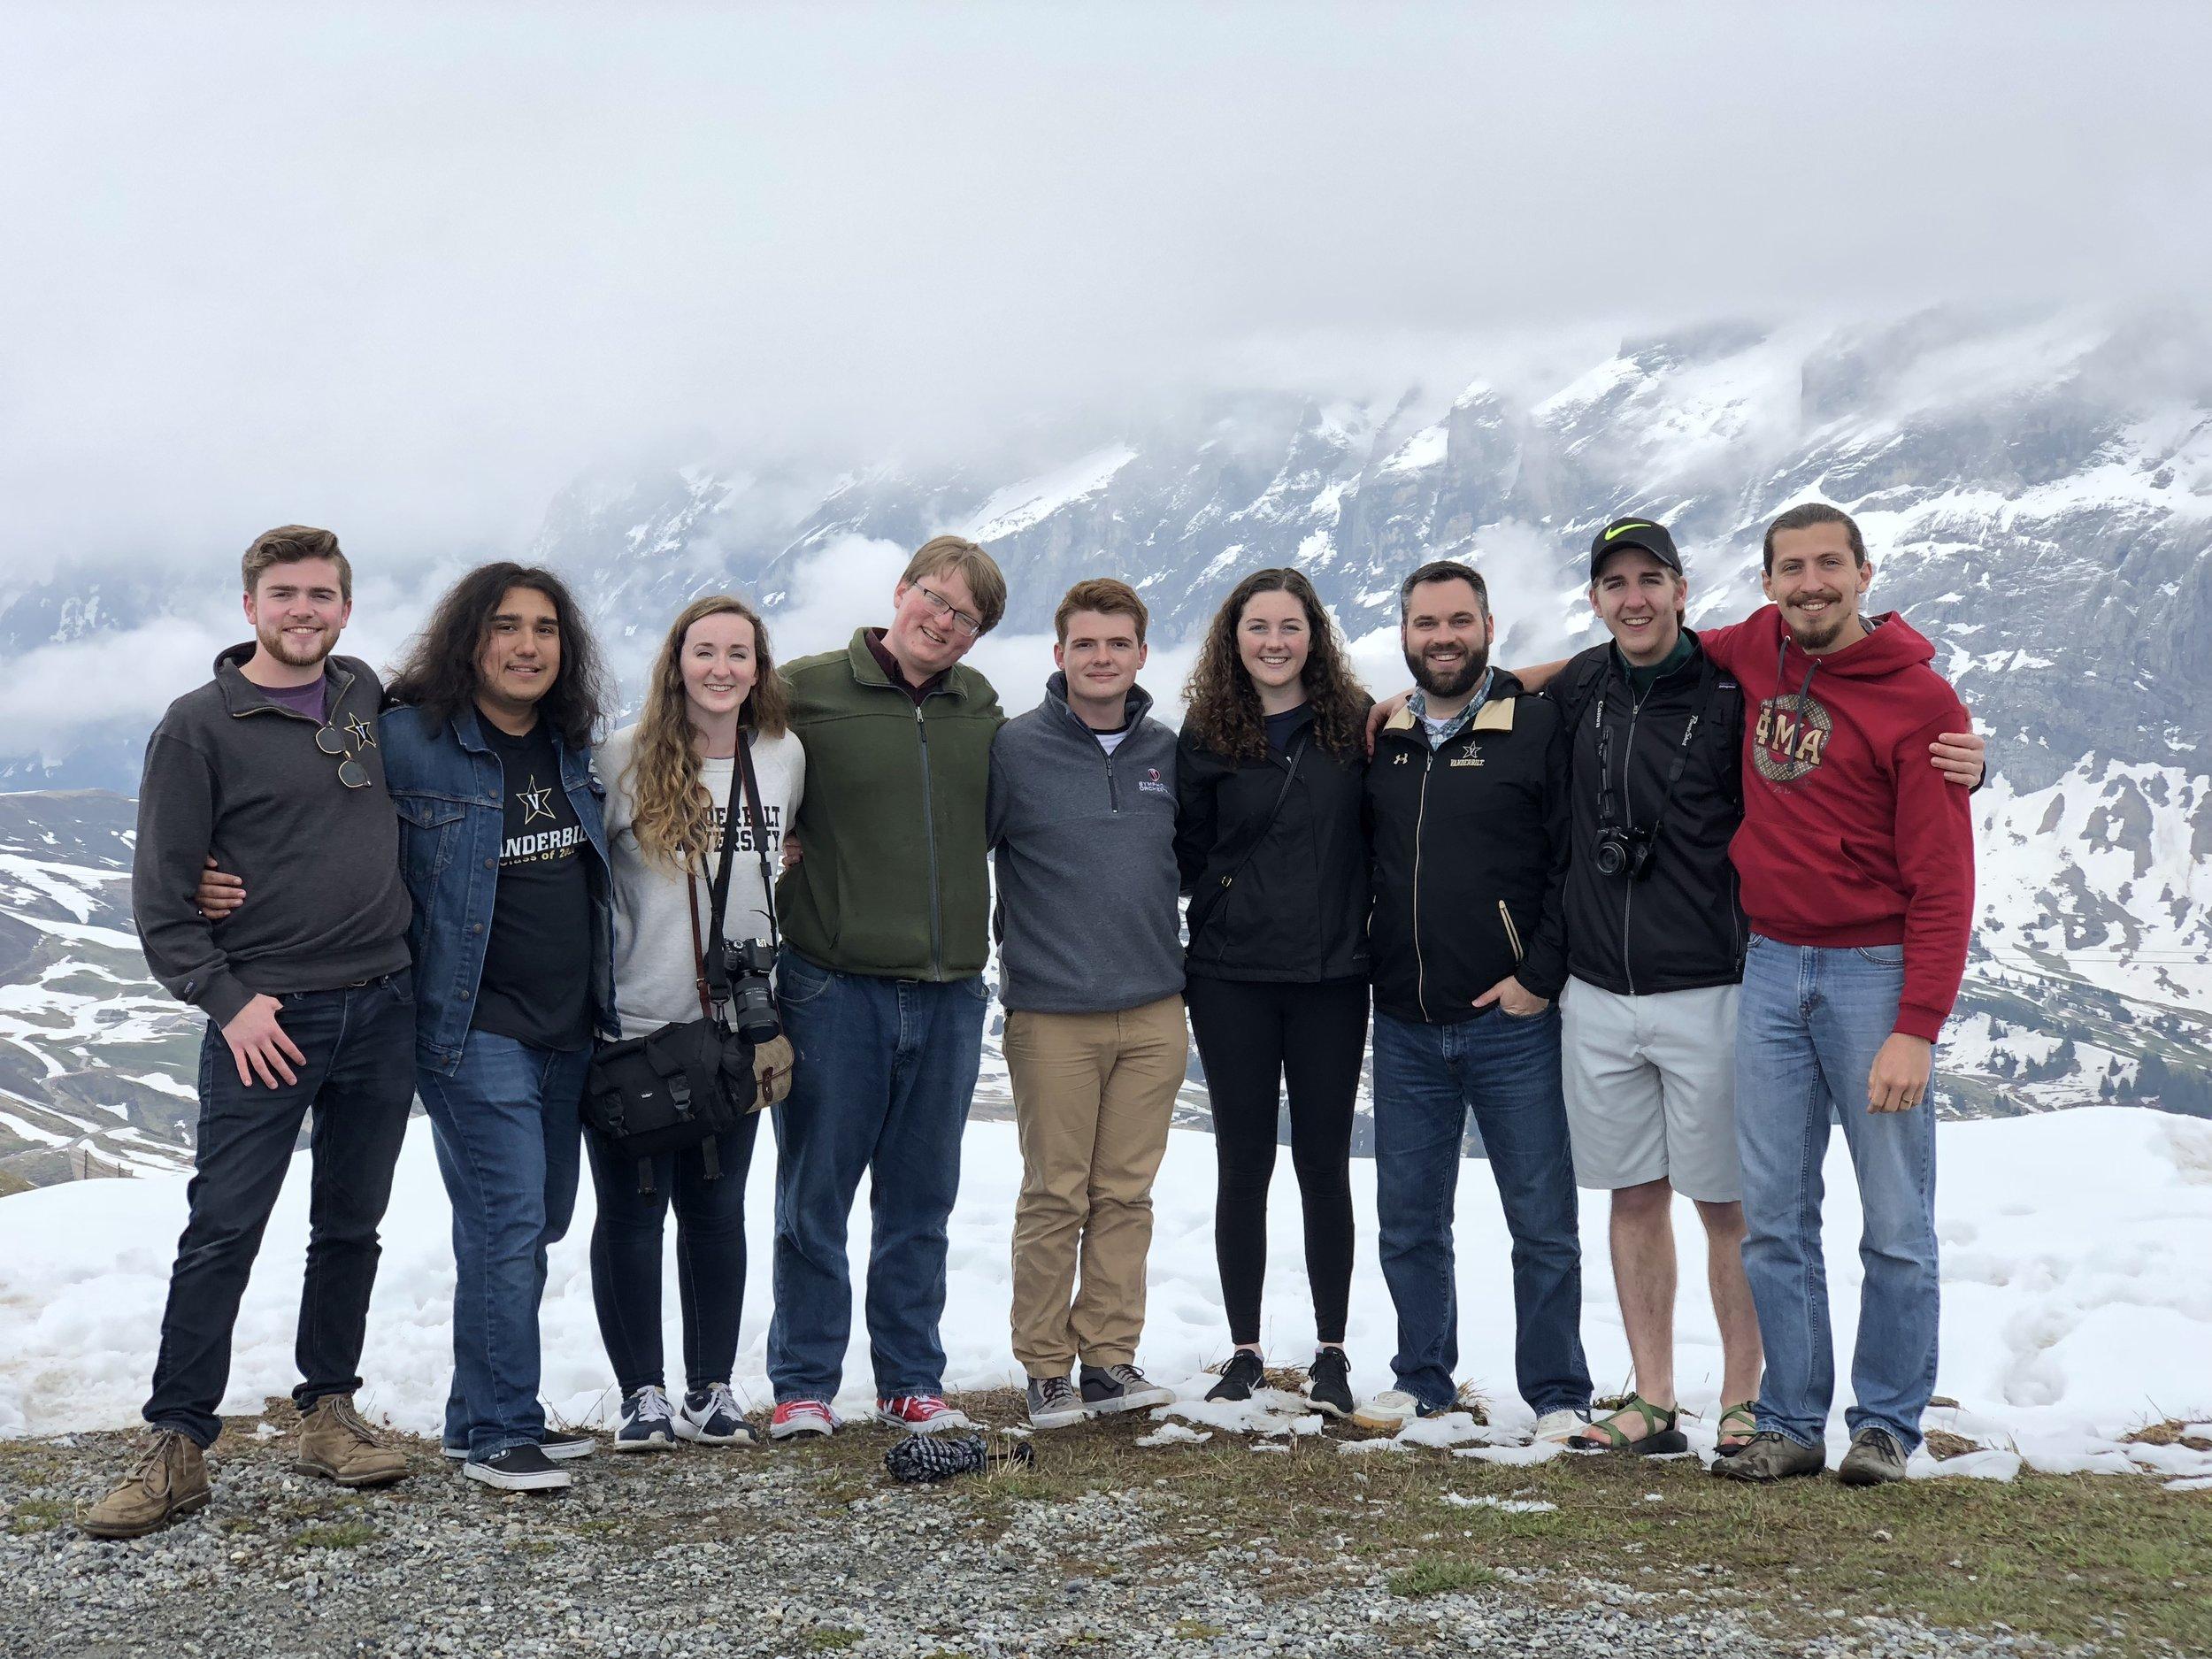 Atop a mountain near Grindelwald, Switzerland